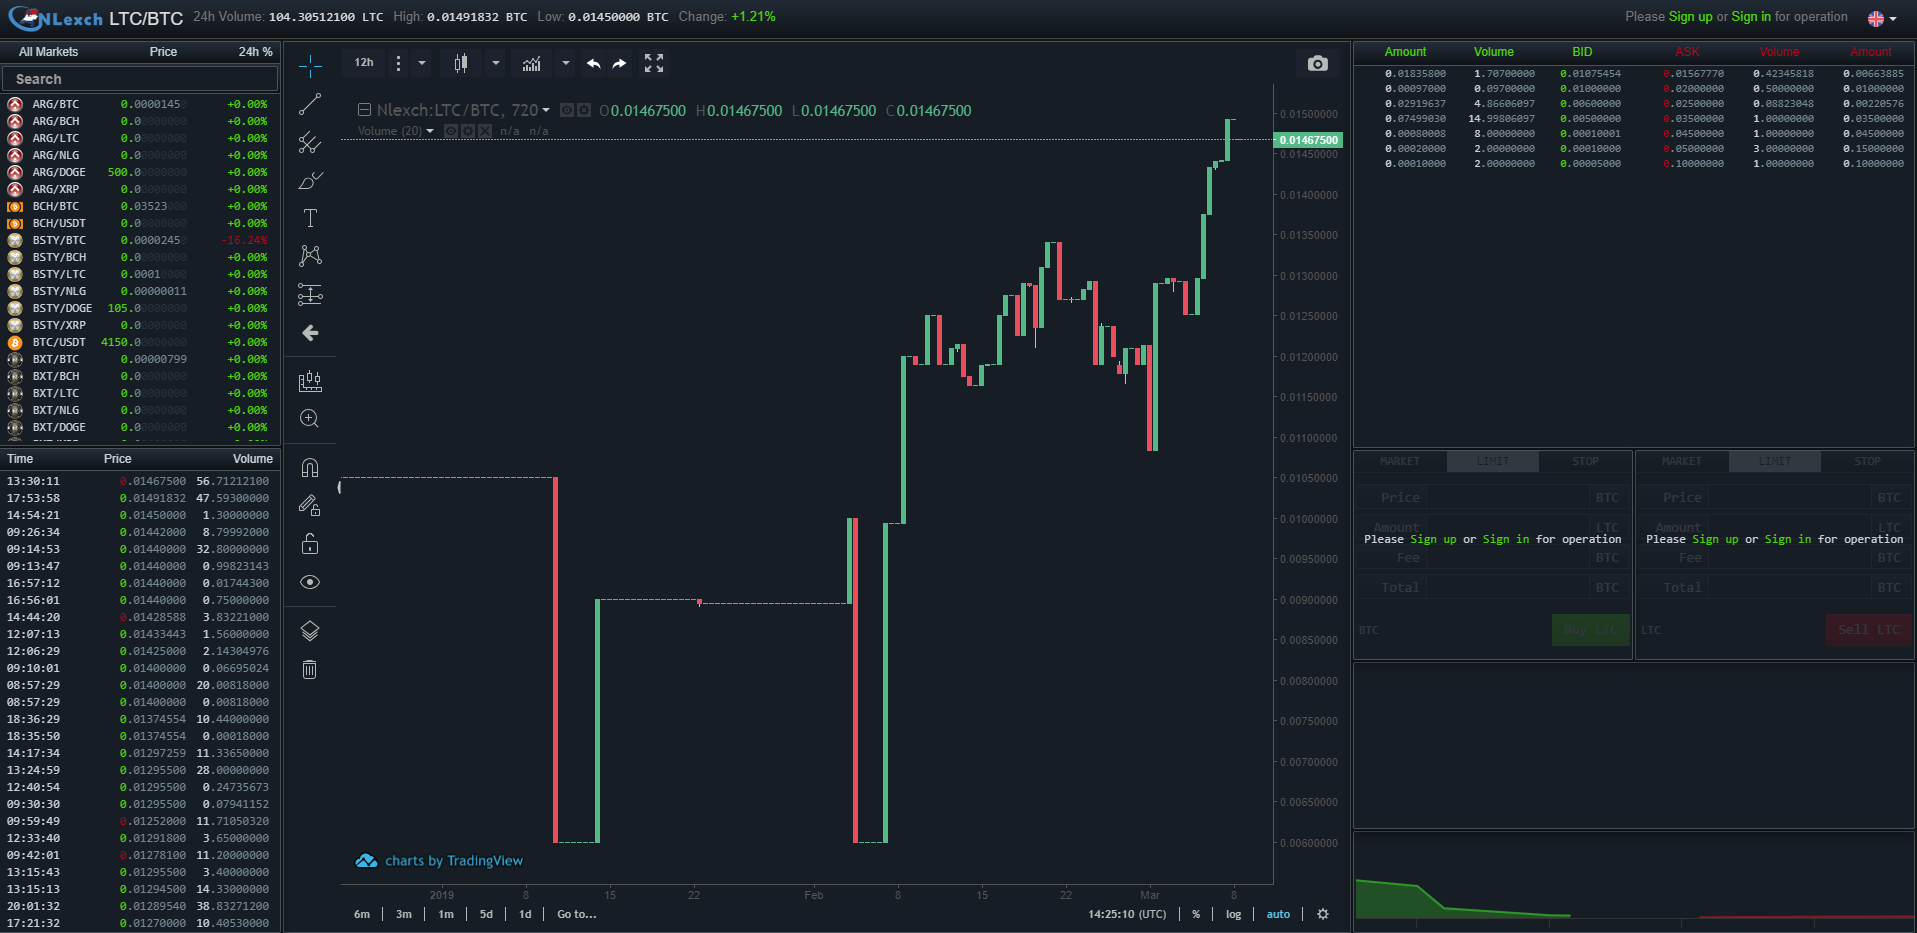 NLexch Trading View